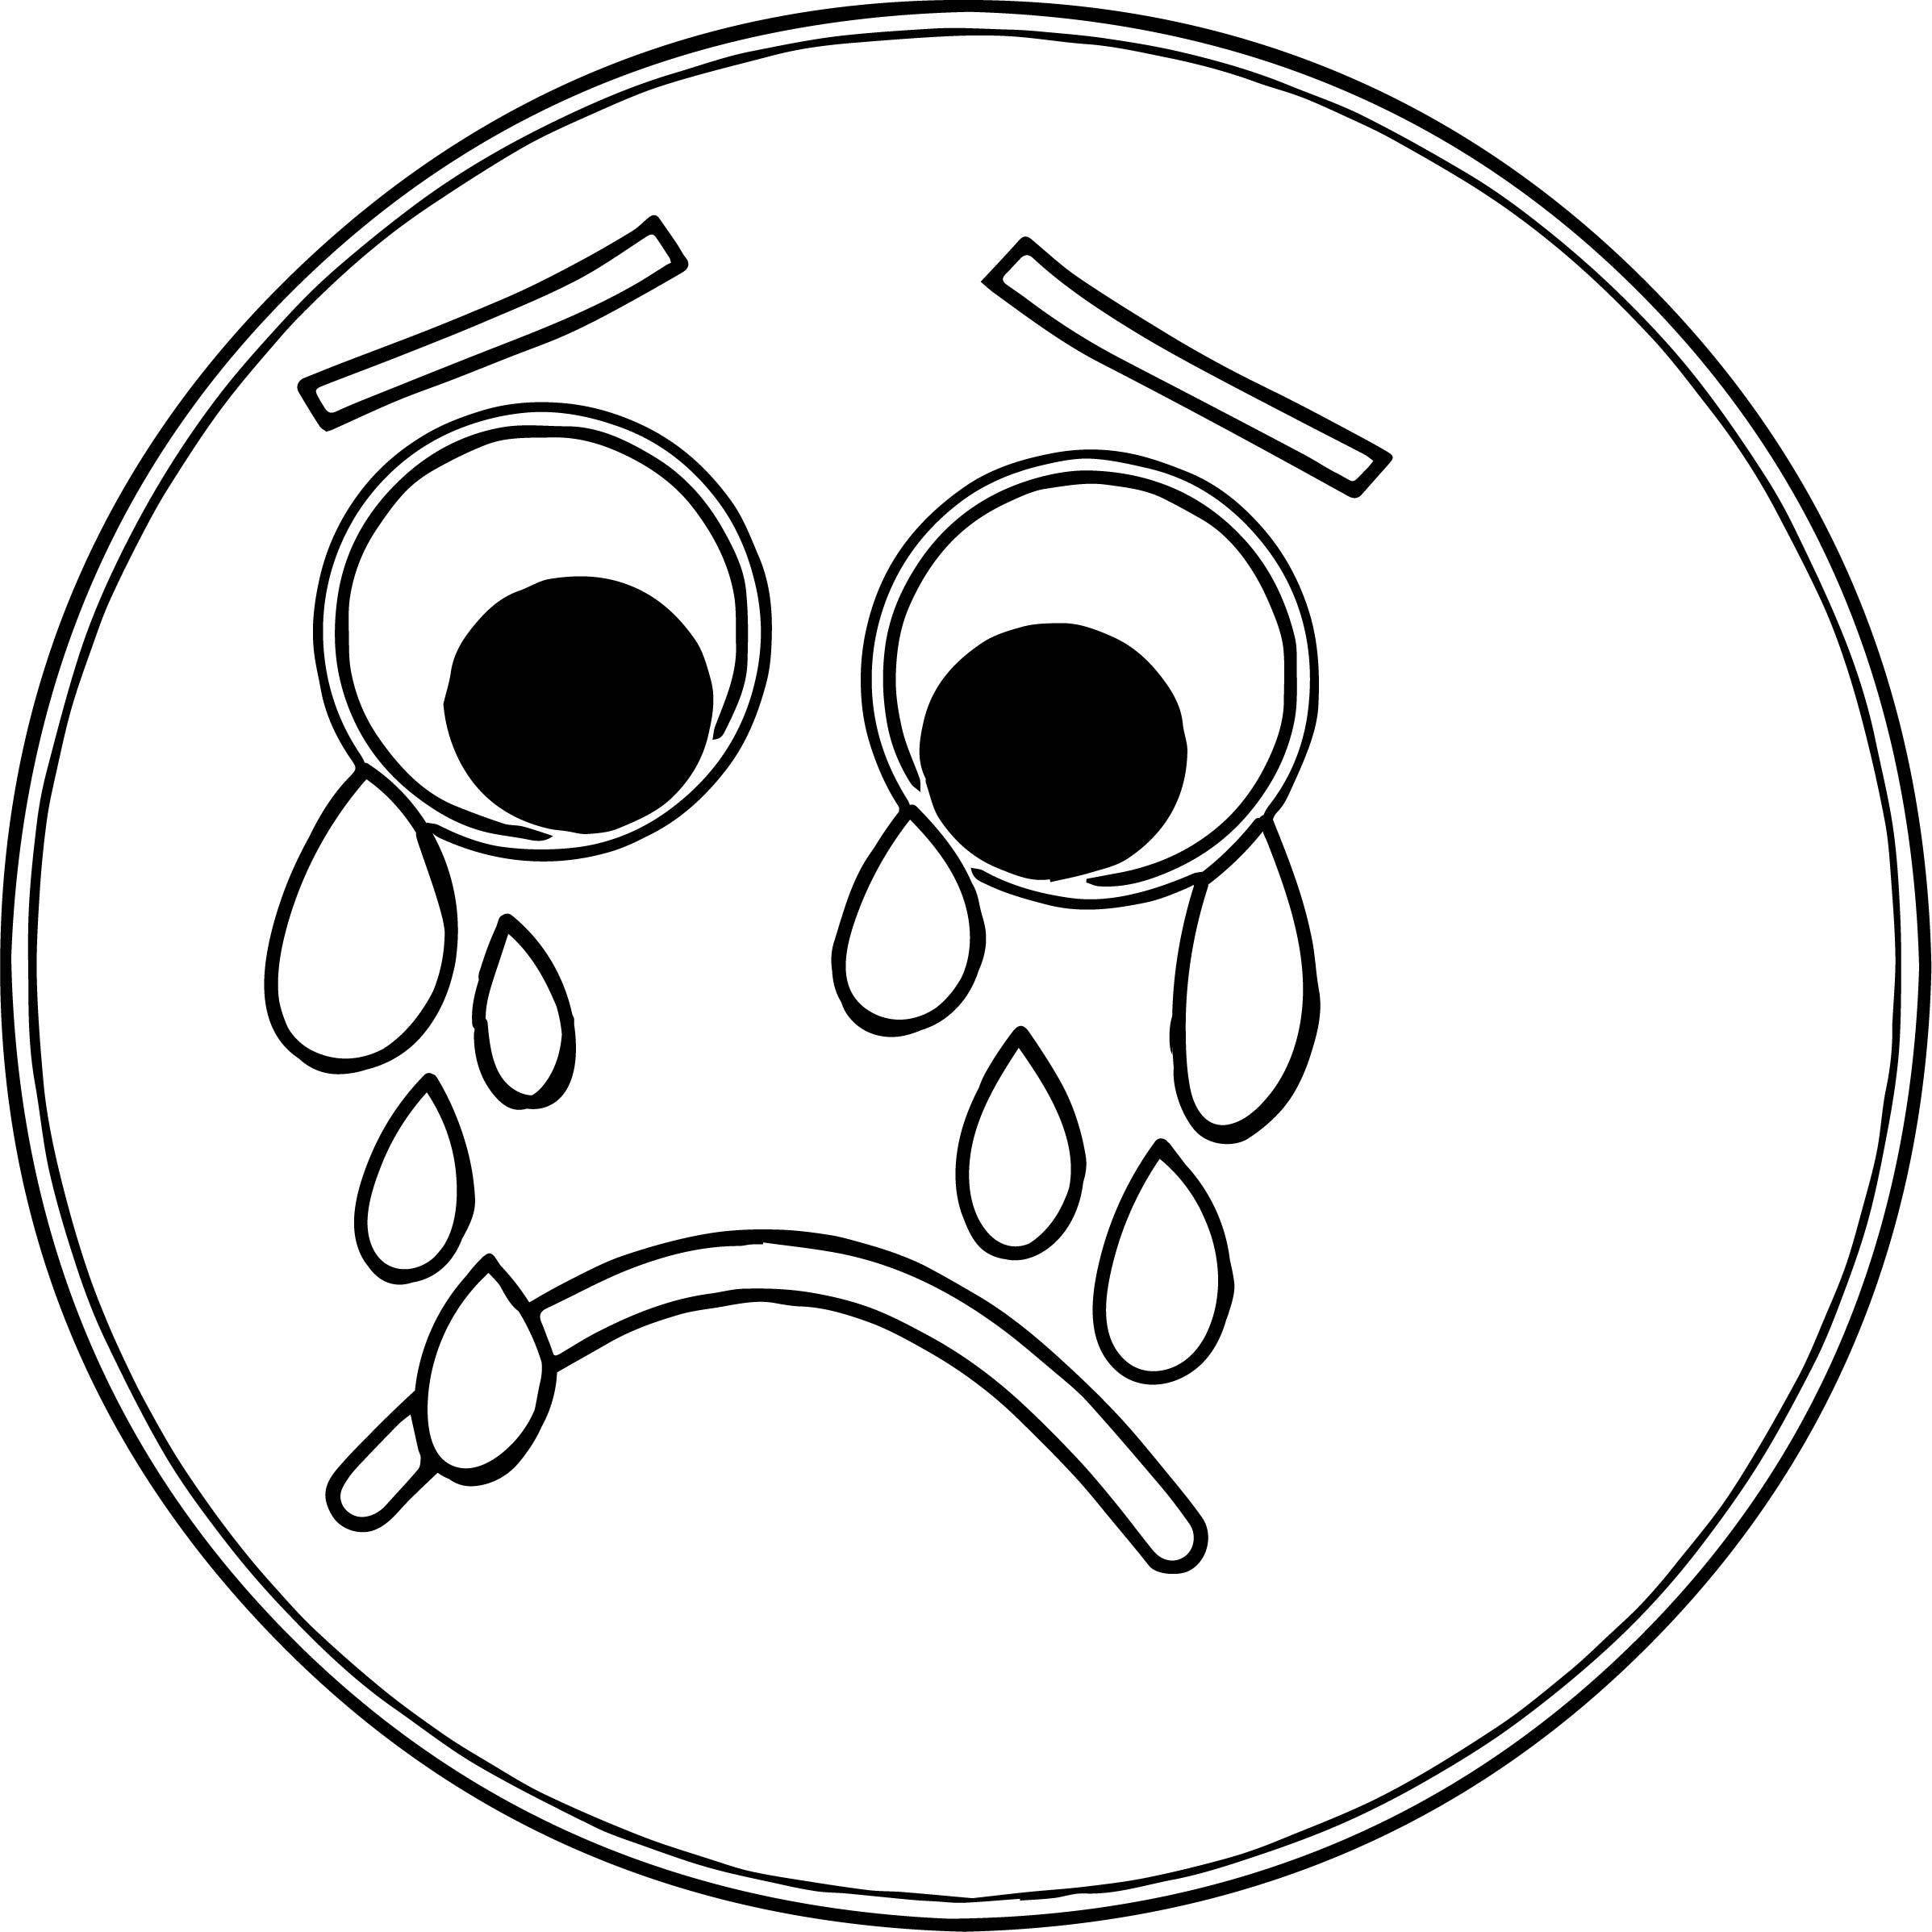 2395x2395 Sad Coloringe Getes Anime Emoji For Adults Happy Girl Remarkable